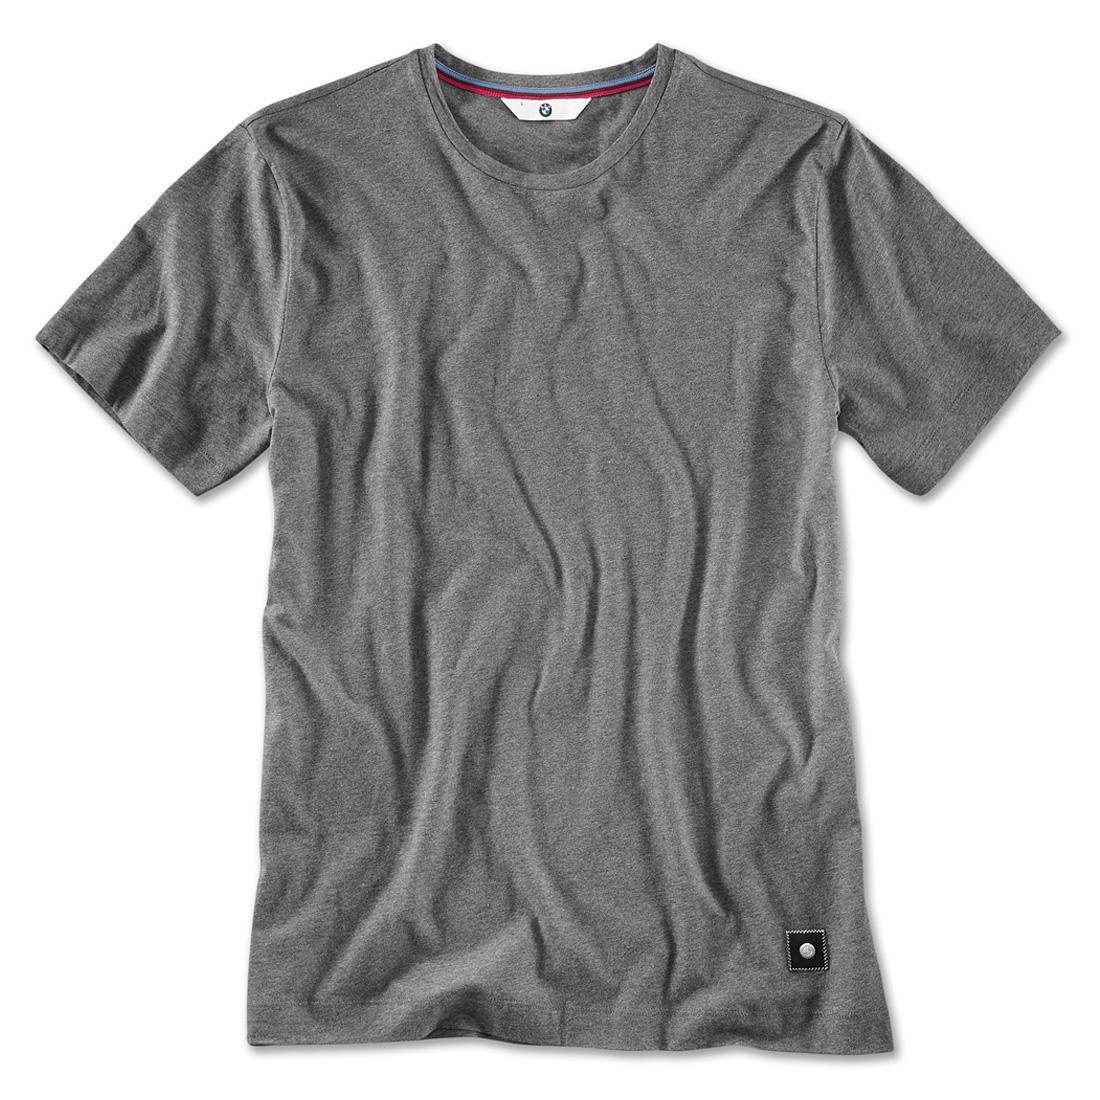 Shopbmwusa Bmw T Shirt V Neck Mens Grey